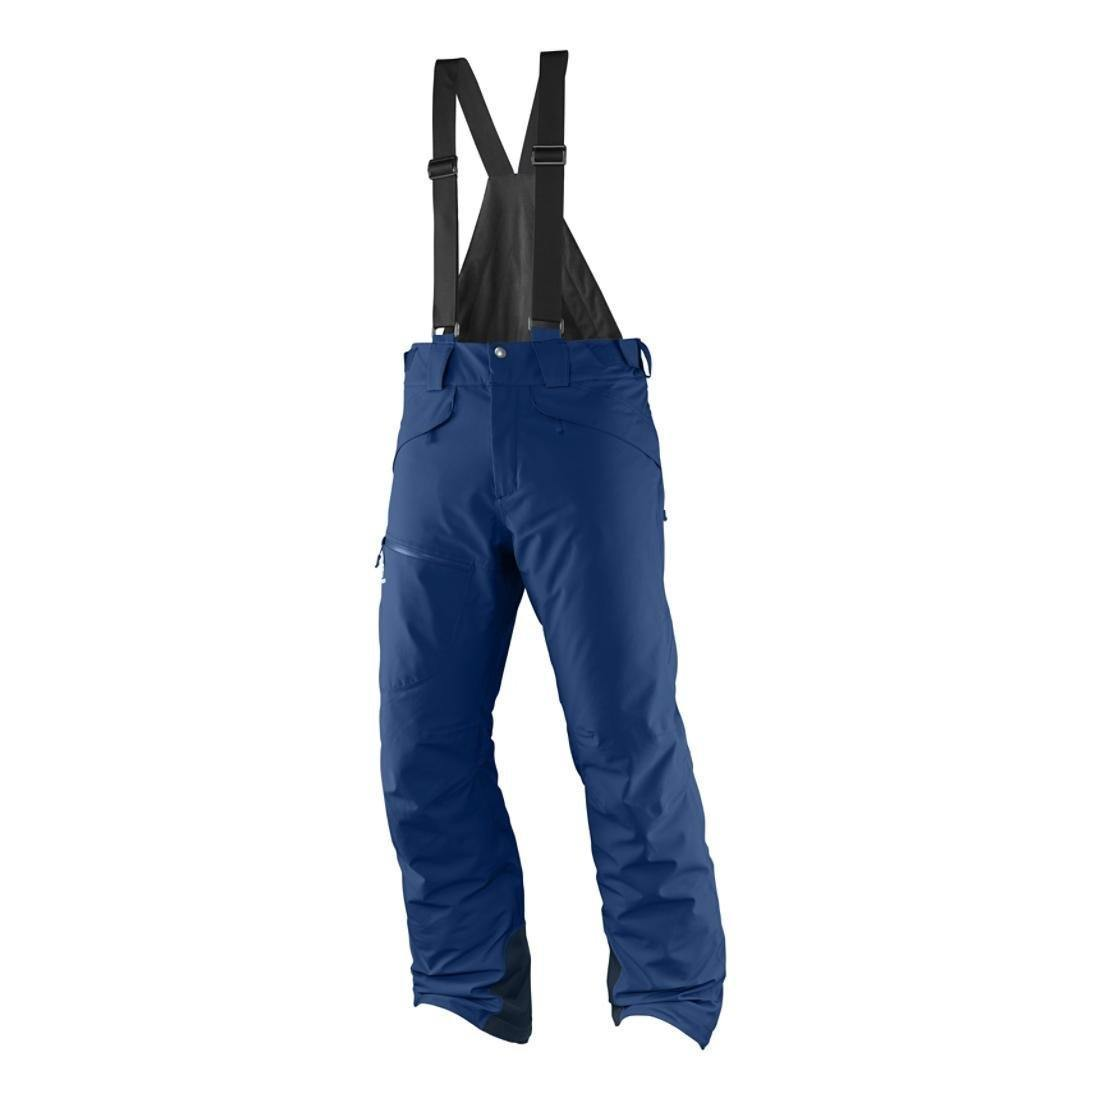 940489dacd 20 Best Ski Pants for the 2018-2019 Season